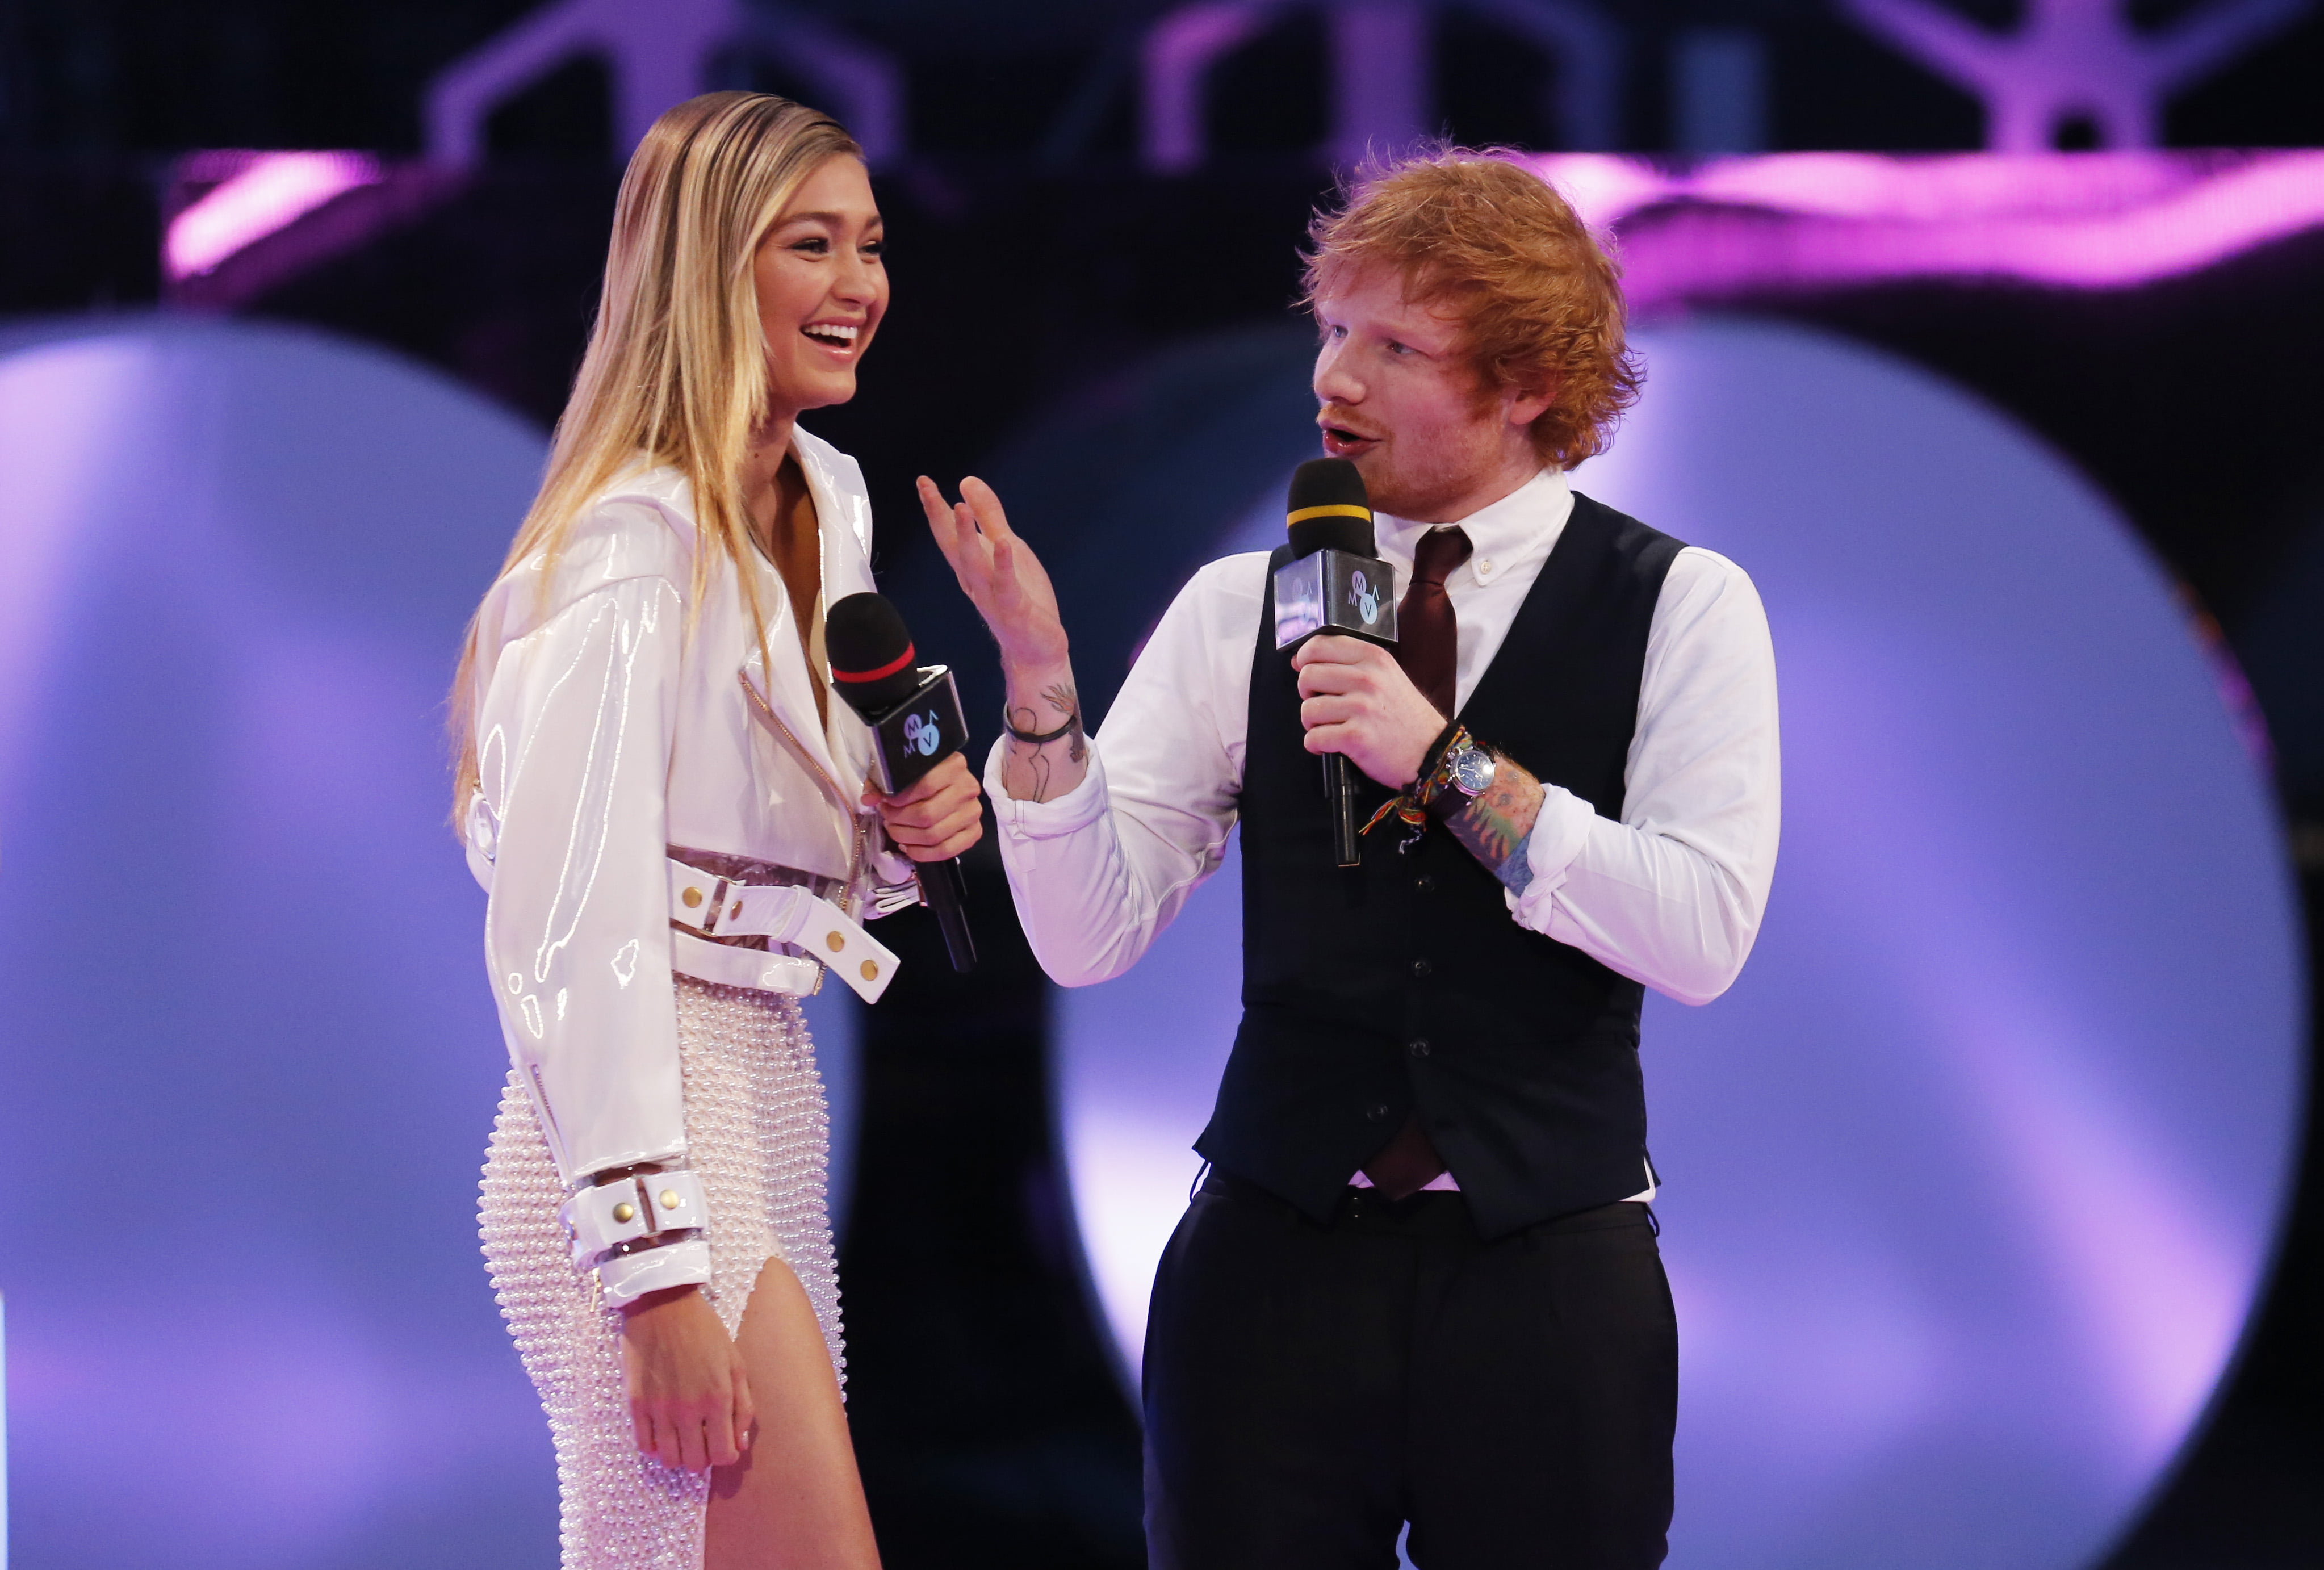 Gigi Hadid and Ed Sheeran